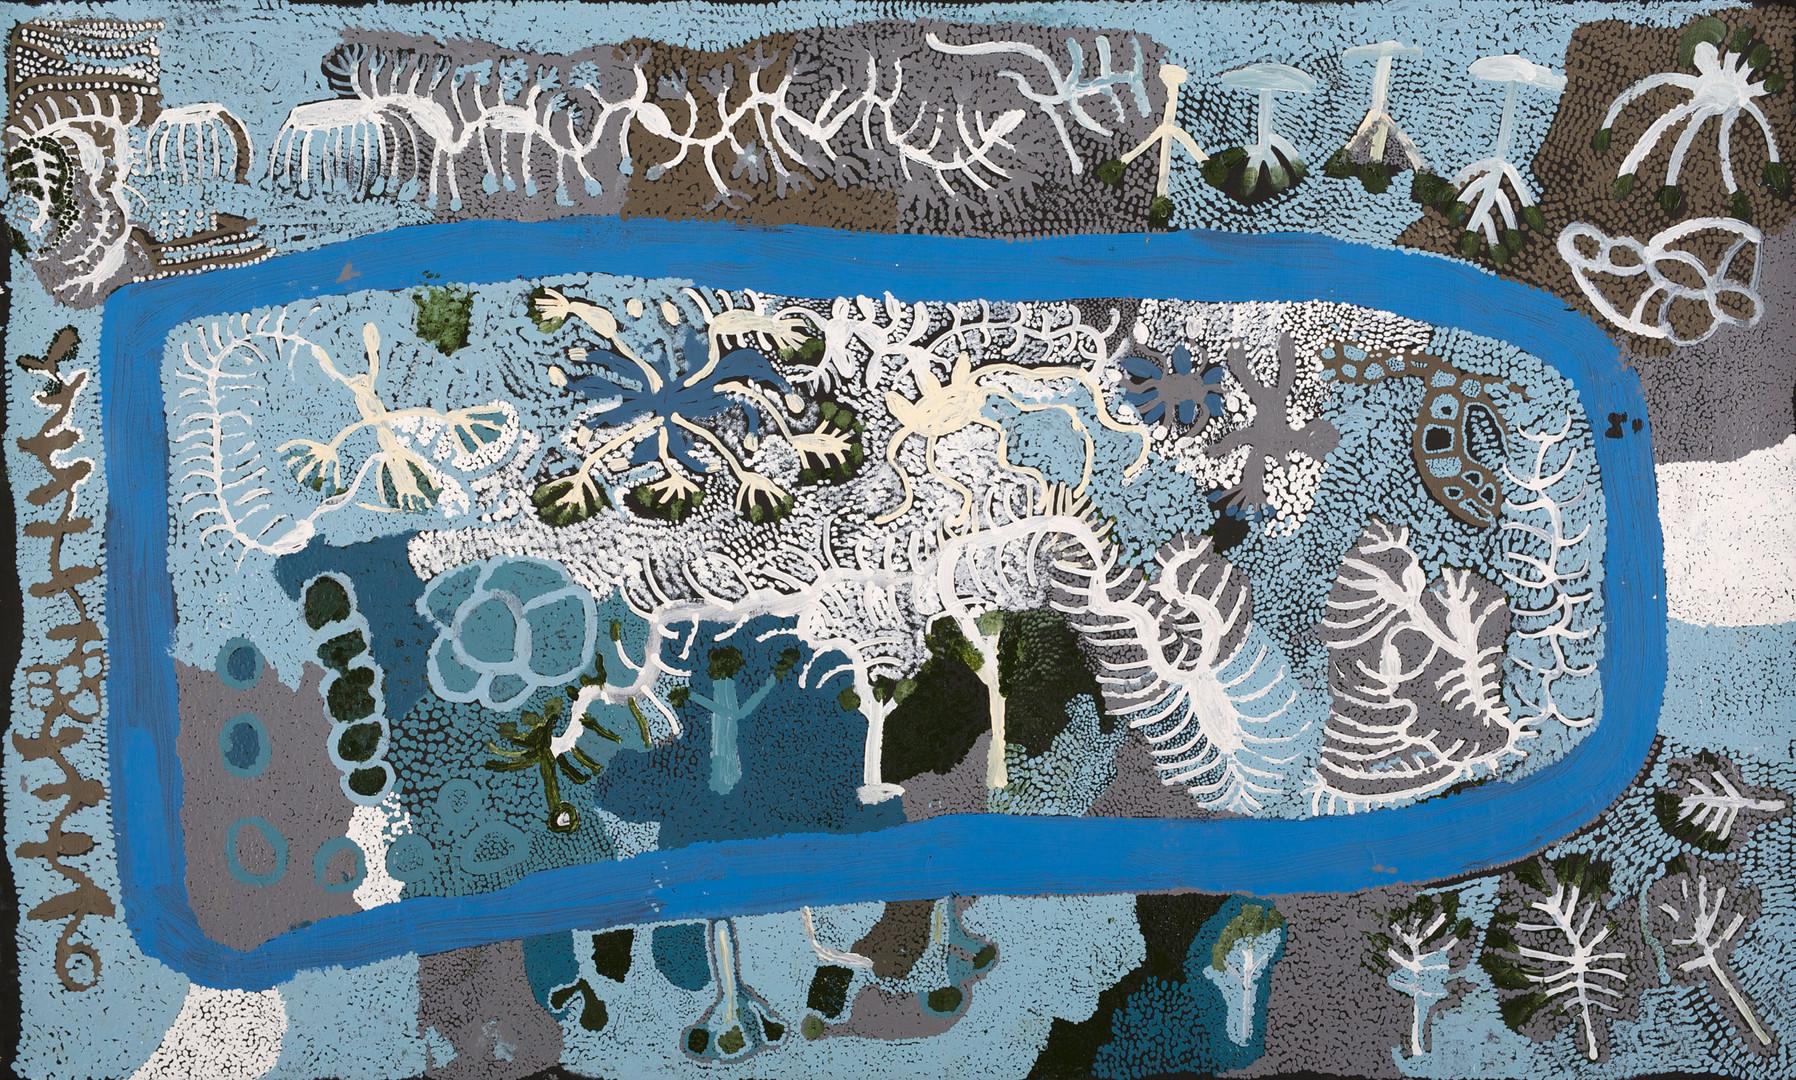 Collaboration by Doris Bush Nungarrayi and Martha McDonald Napaltjarri